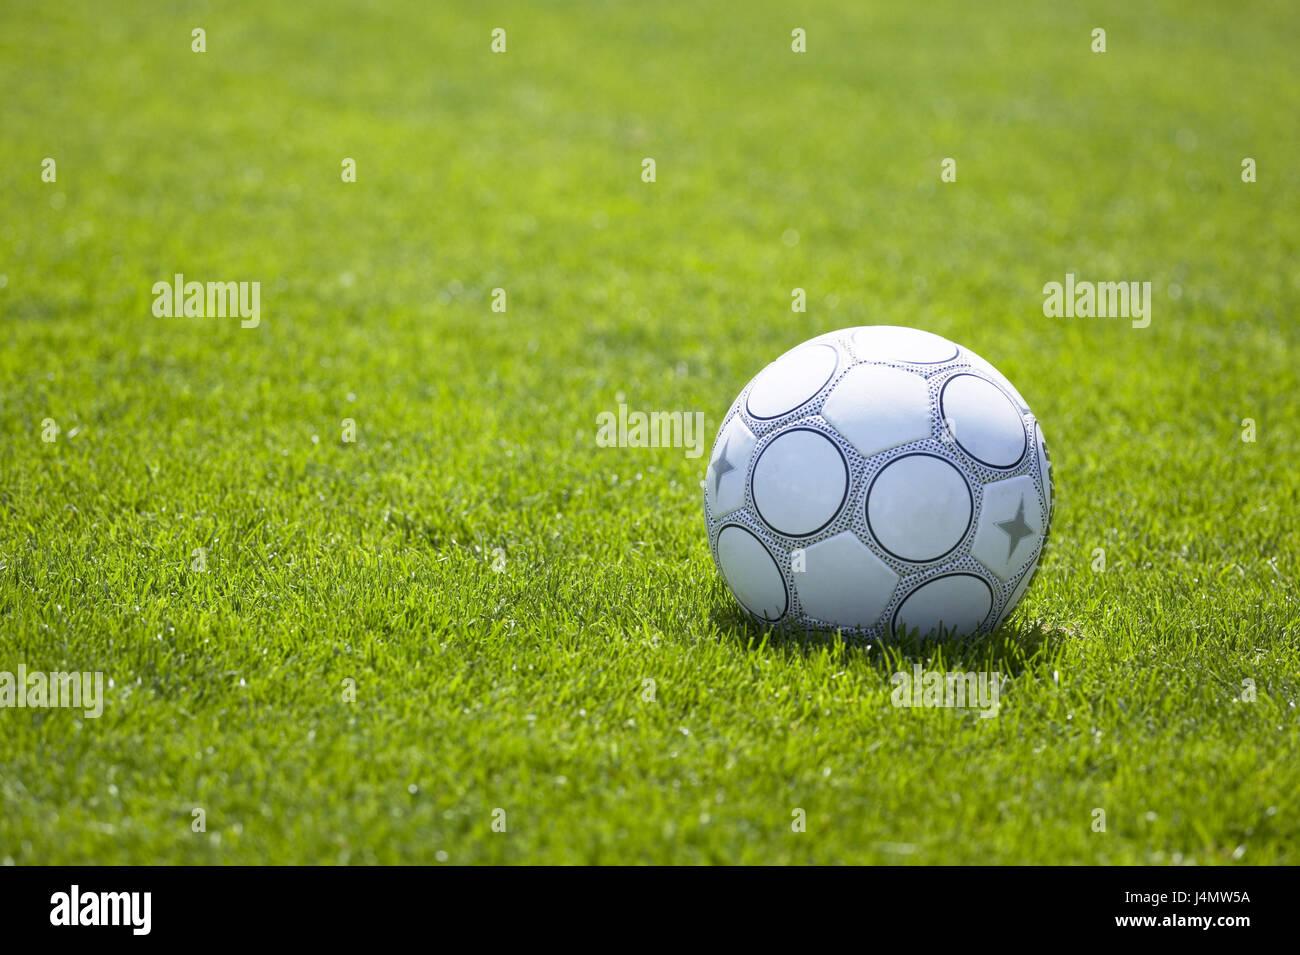 Turfs, football ball, sports device, leather ball ball, black-and-white, ball game, leather ball football, sport, - Stock Image